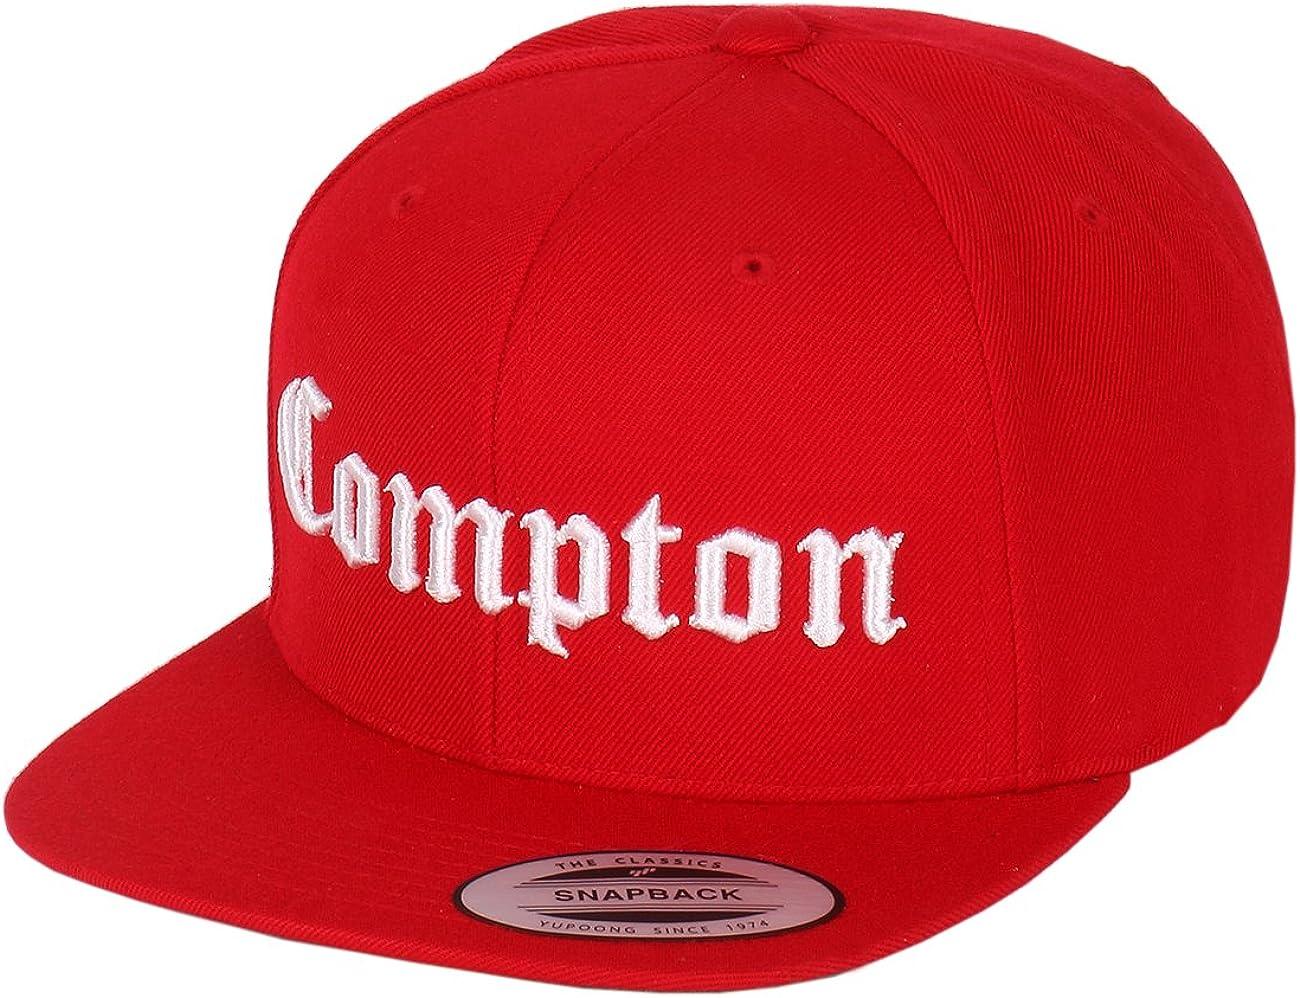 1611MAIN Compton Embroidery...